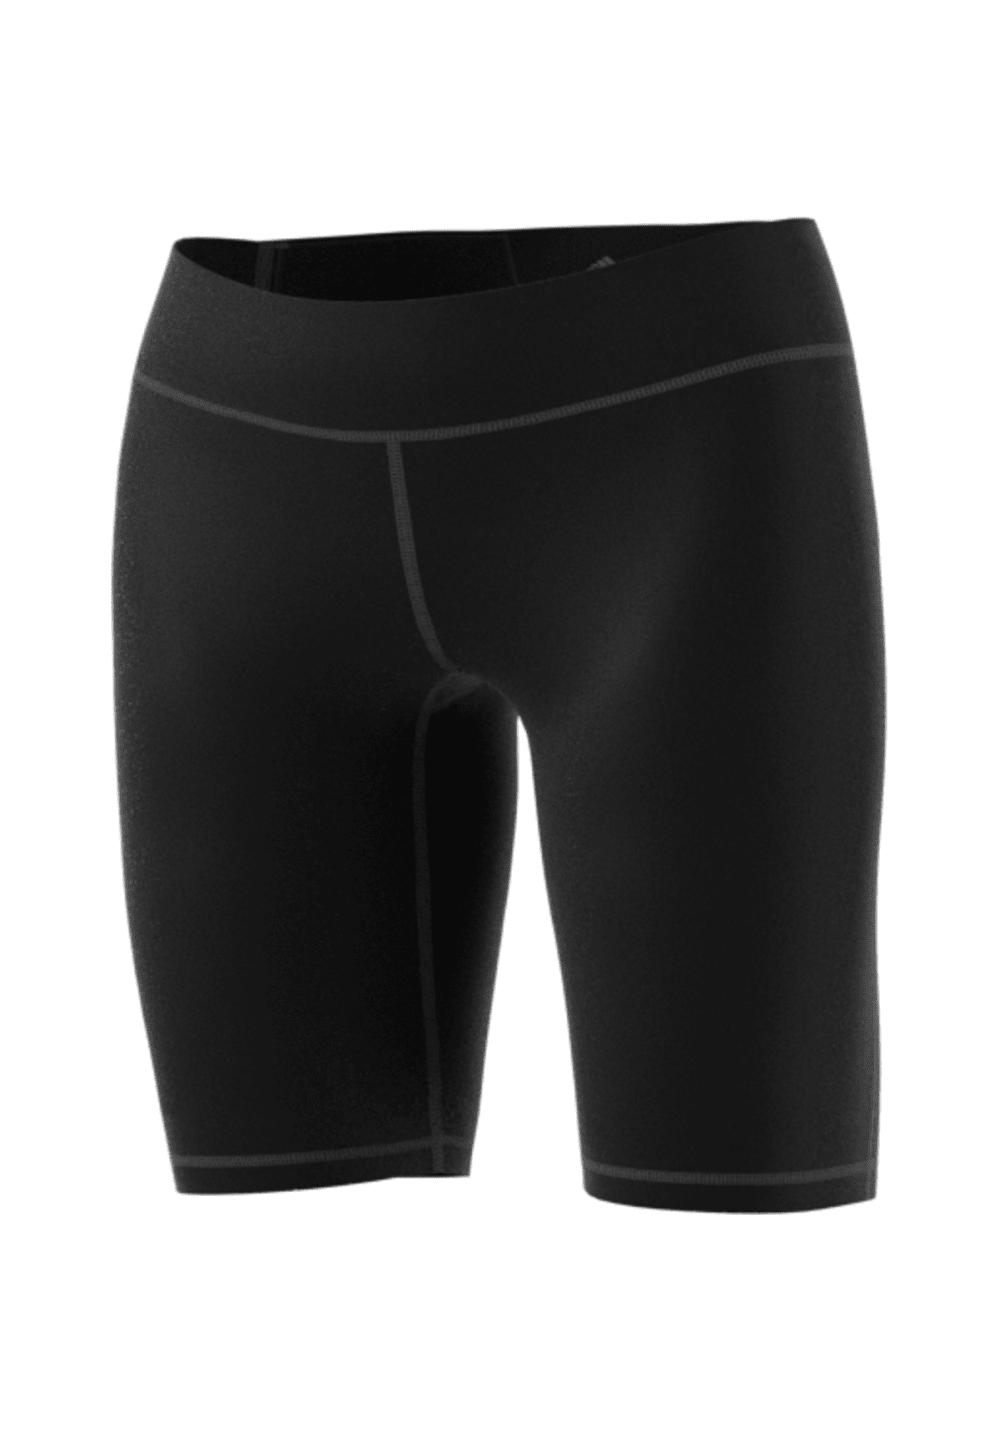 adidas Vfa Rr Shorty - Fitnesshosen für Damen -...